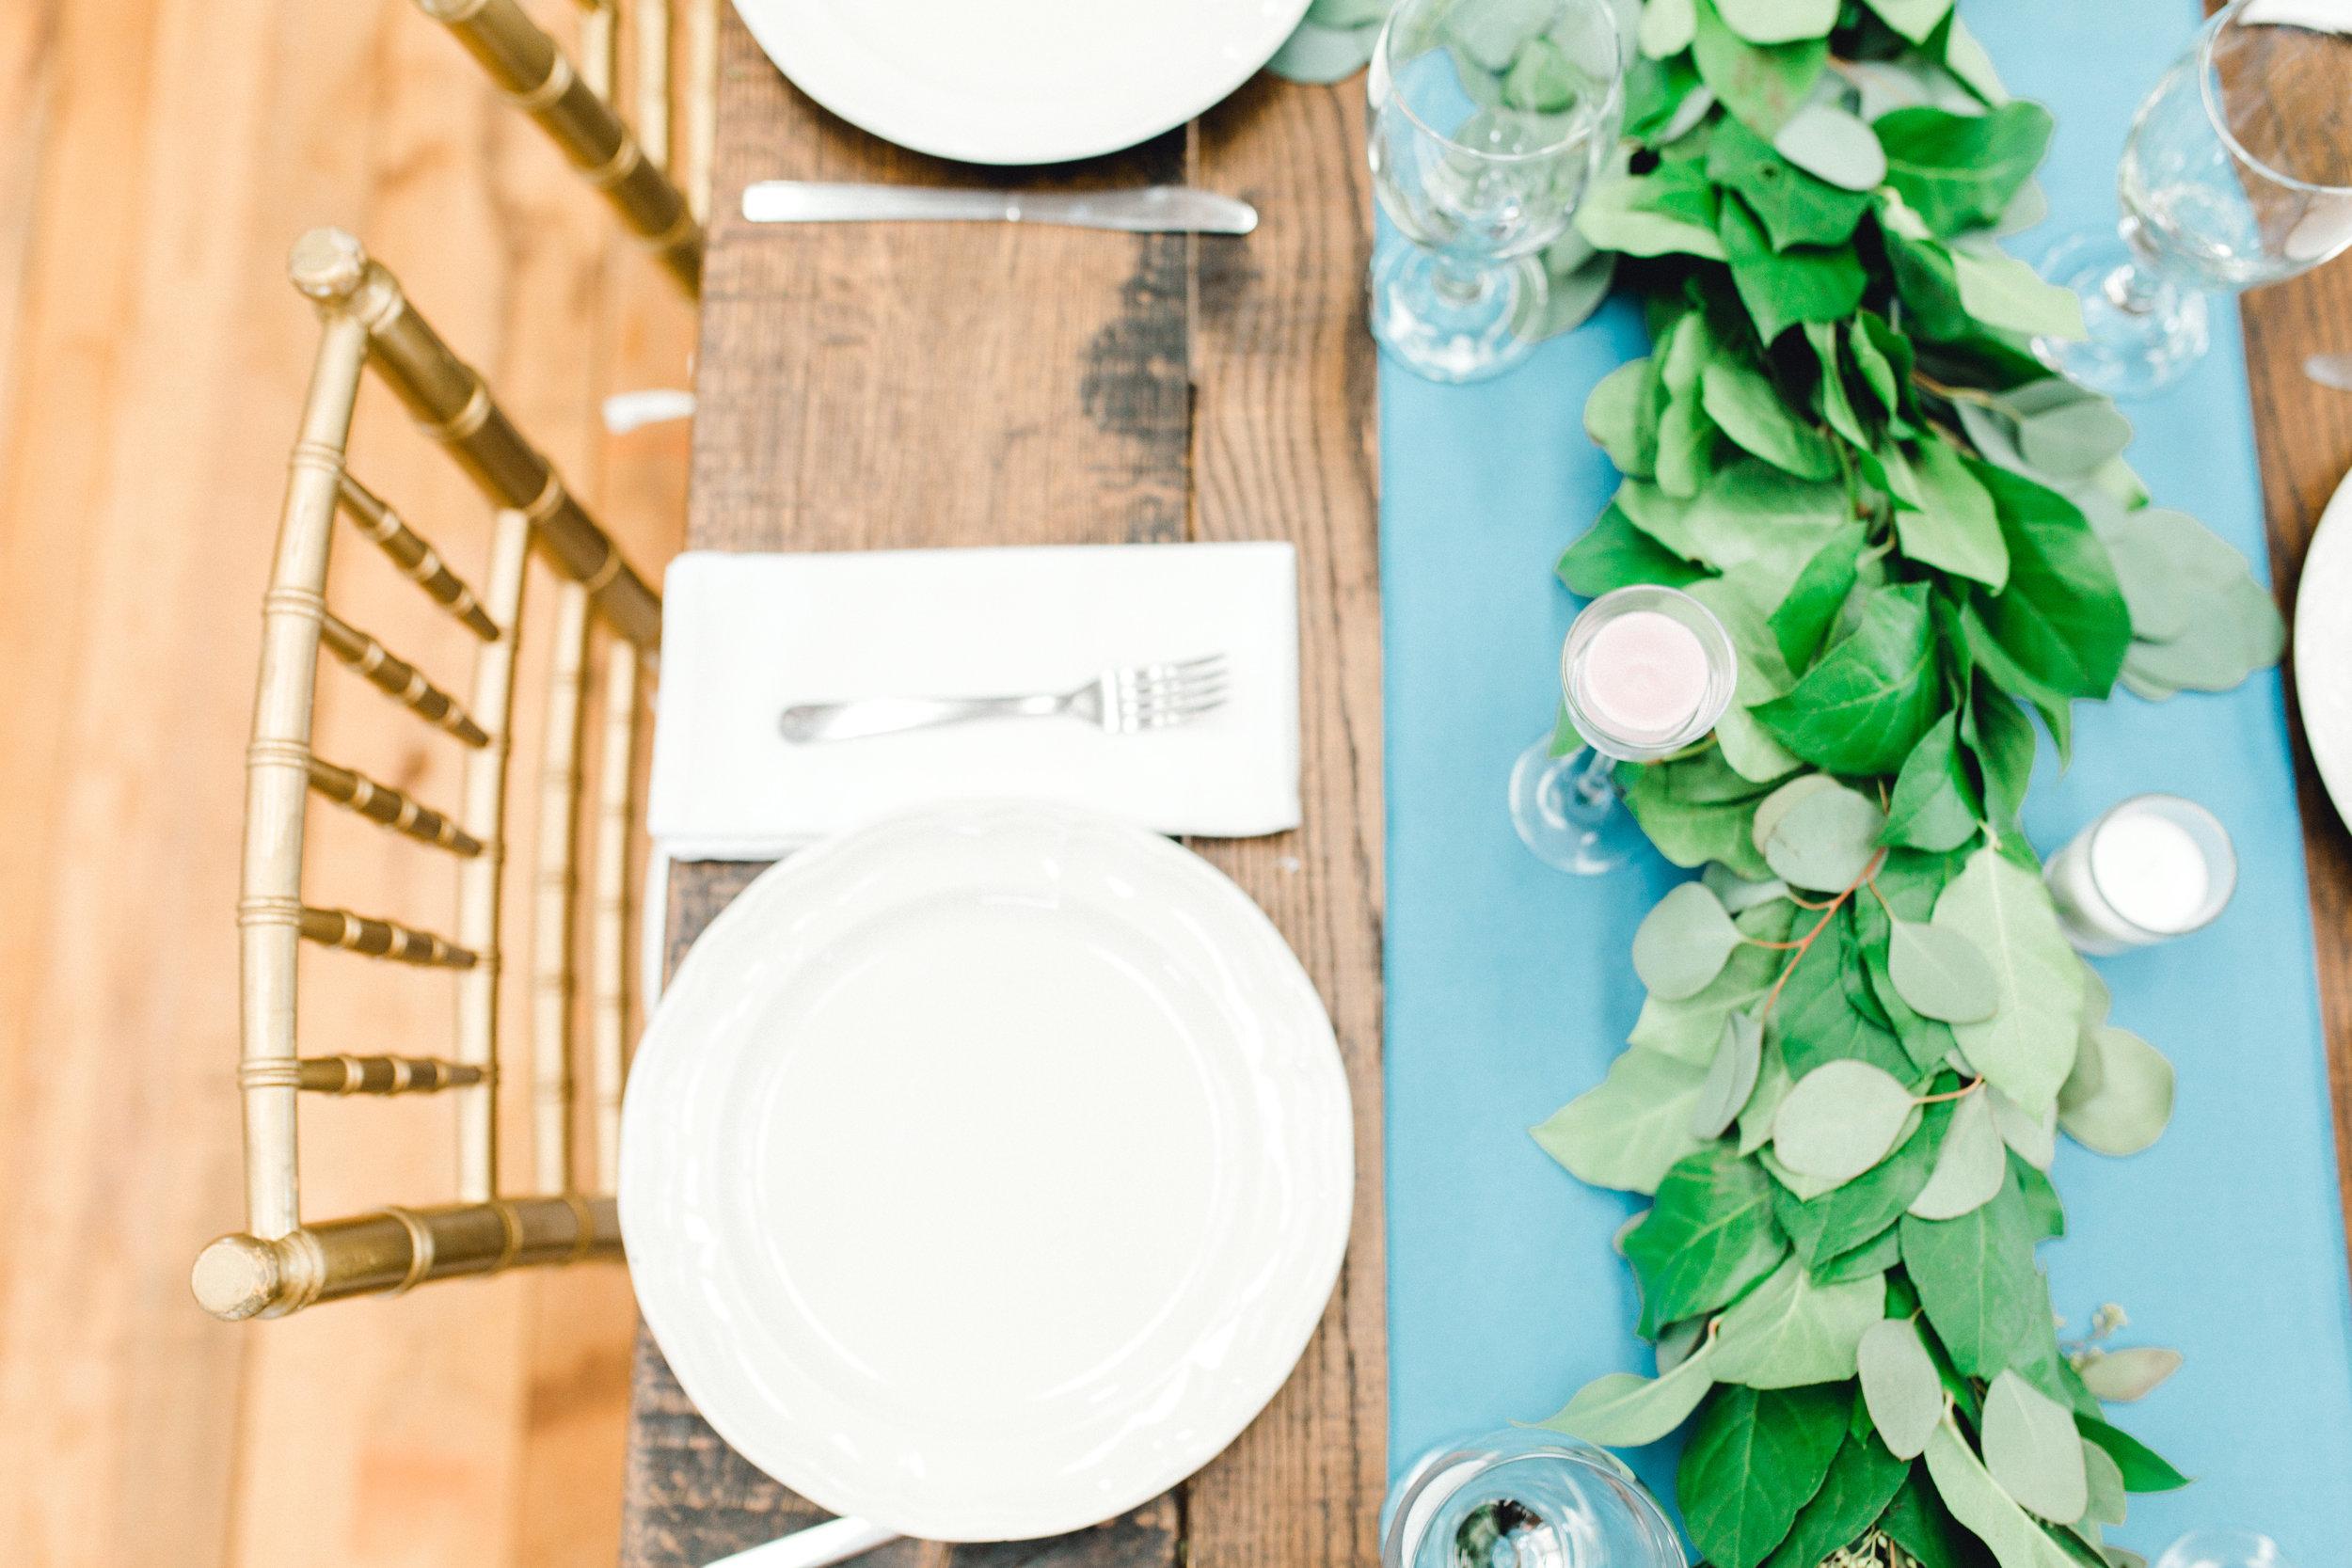 Paige-Mercer-Photography-Florida-Wedding-Photographer-Alyssa&Drew-123.jpg